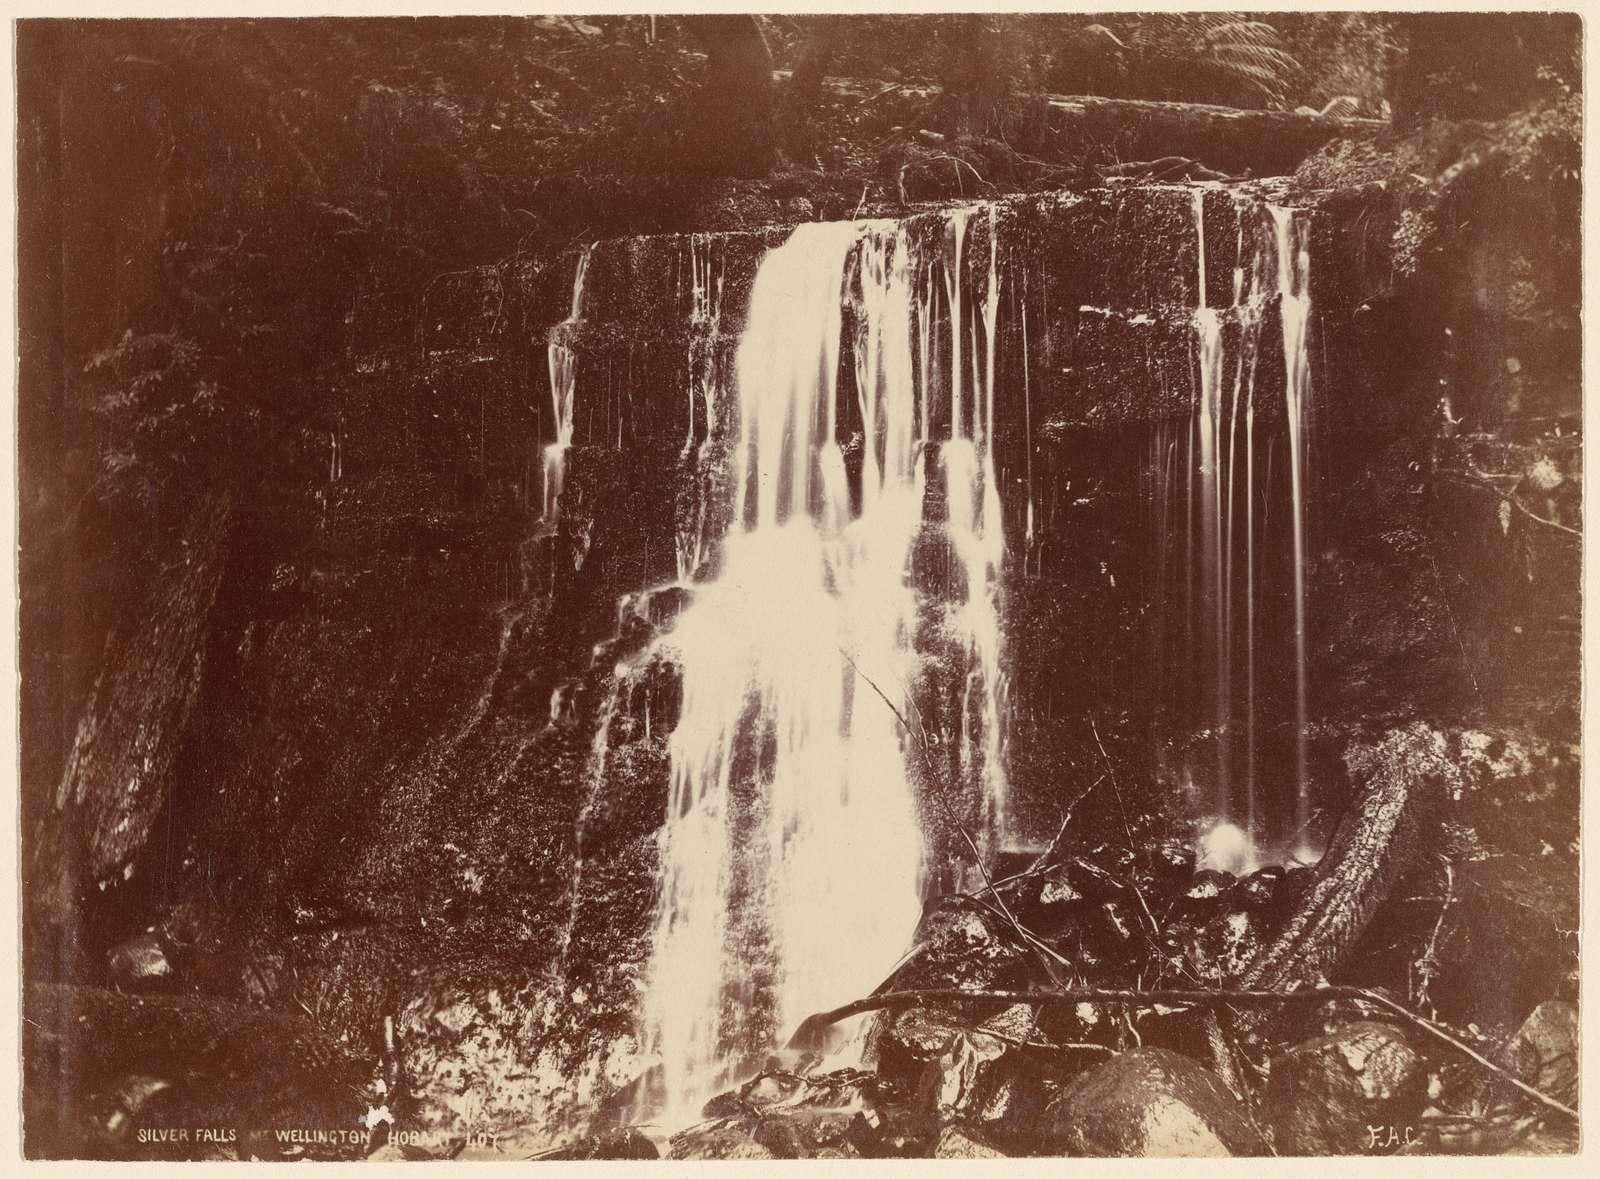 Silver Falls. Wellington, Hobart